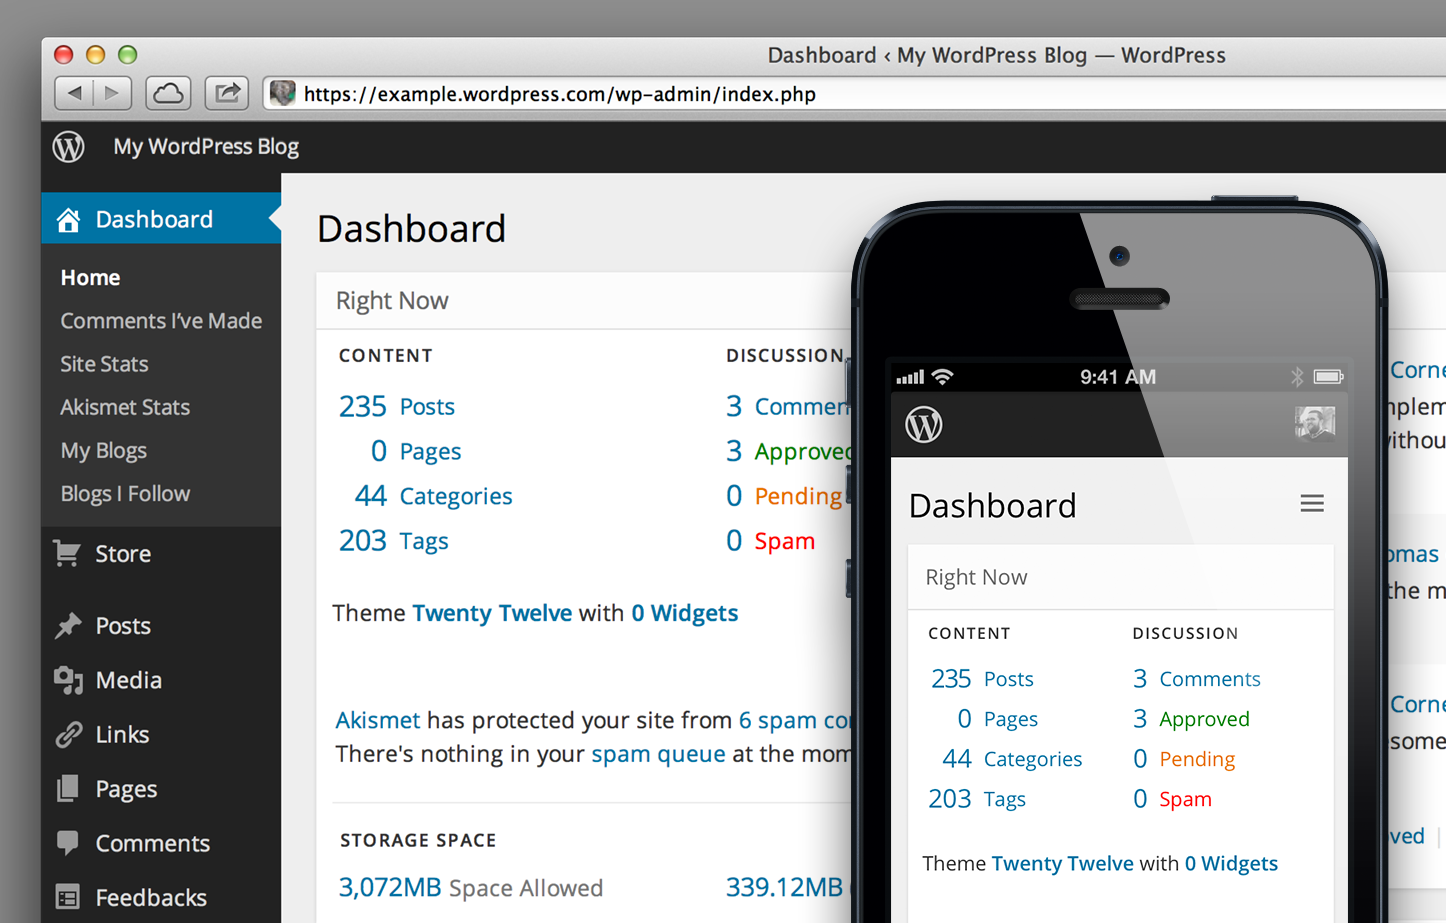 Preview the Future Design of the WordPress Dashboard | Dashboard ...